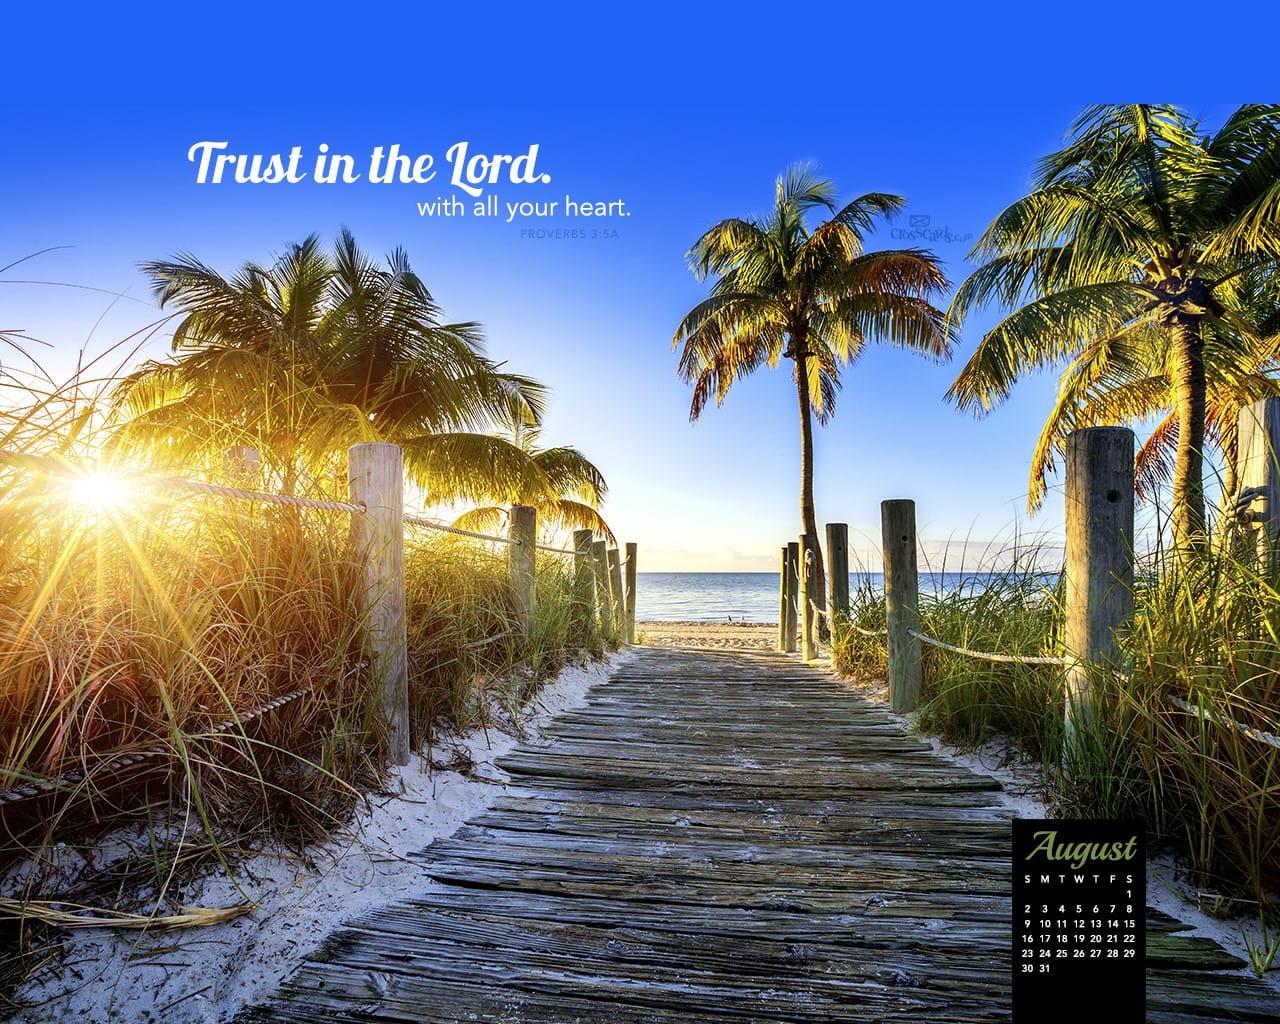 Free Desktop Calendar Wallpaper November : August trust in the lord desktop calendar free